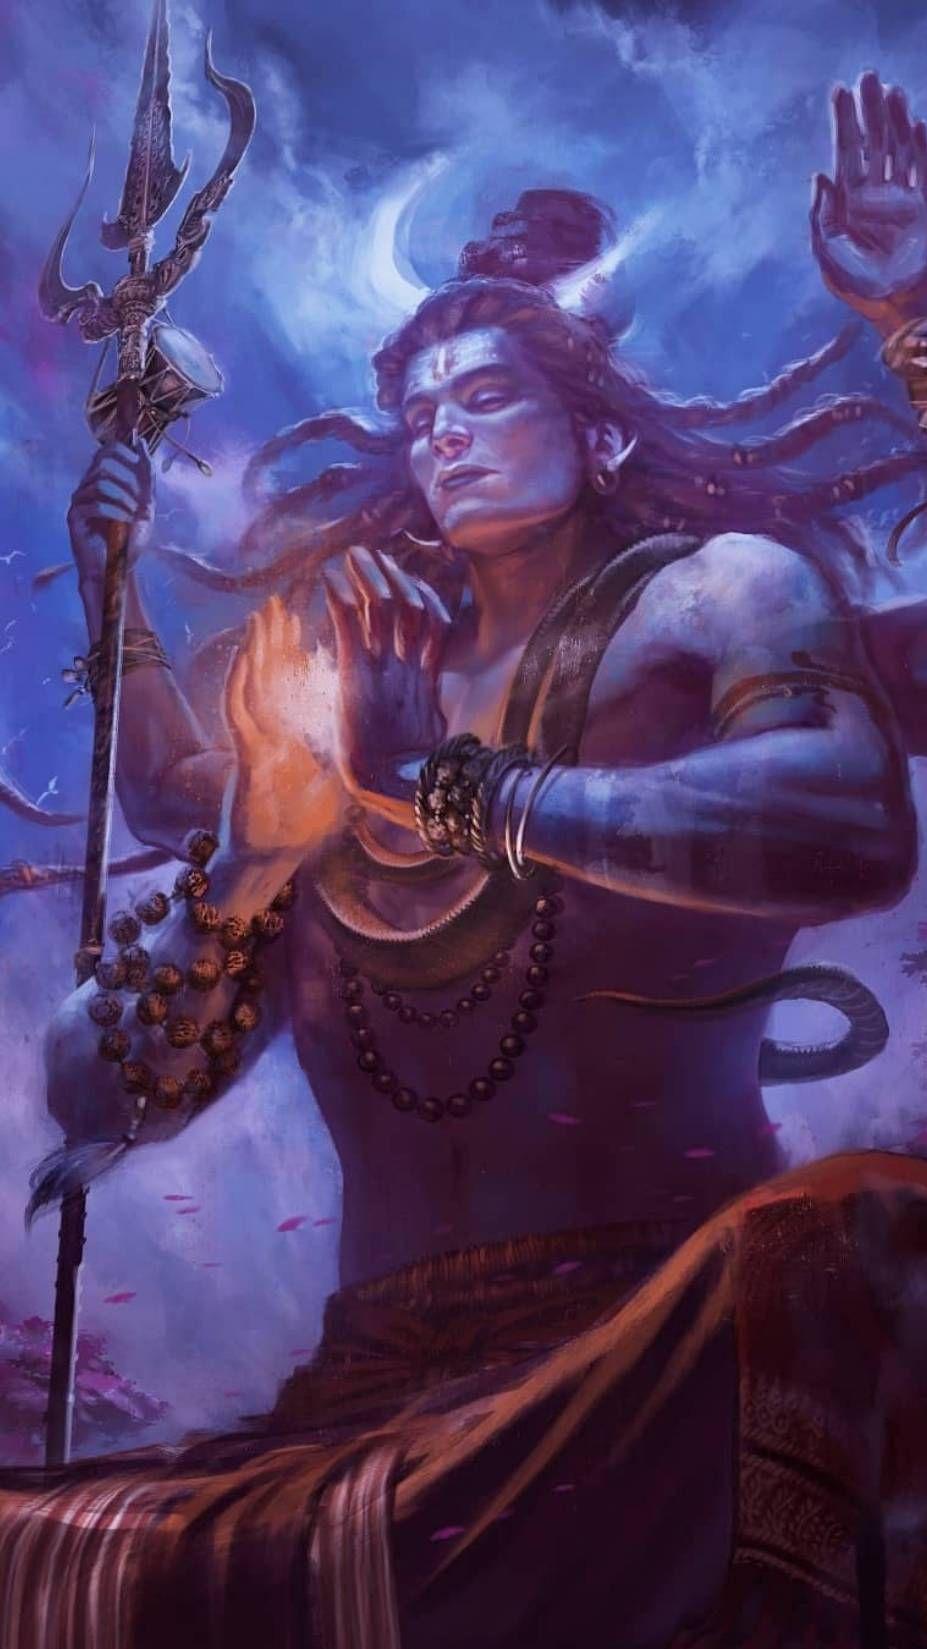 Lord Shiva Meditation Iphone Wallpaper Lord Shiva Painting Shiva Meditation Shiva Lord Wallpapers